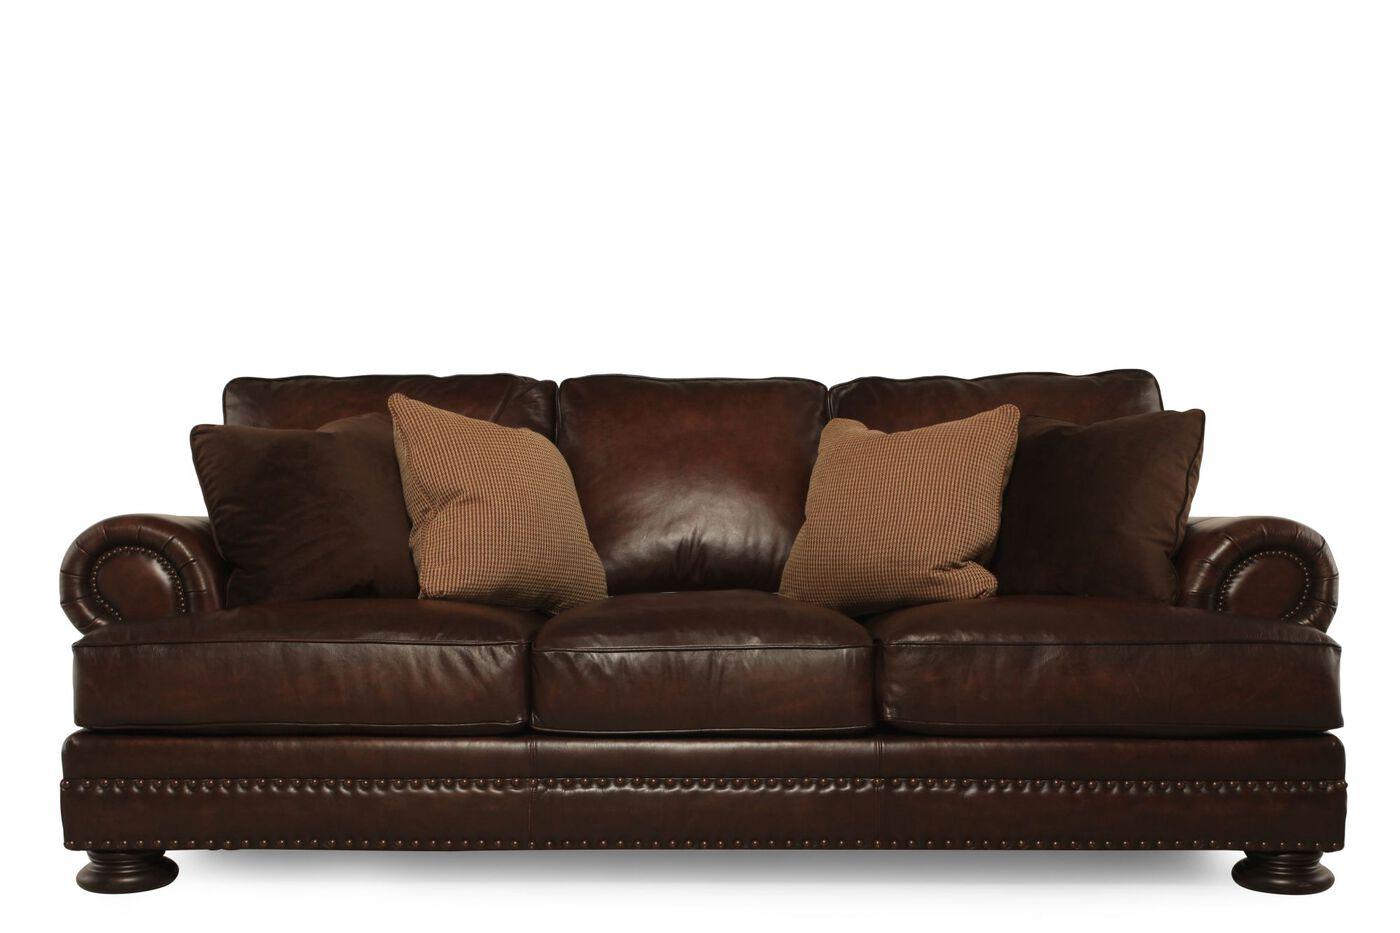 Bernhardt Foster Leather Sofa